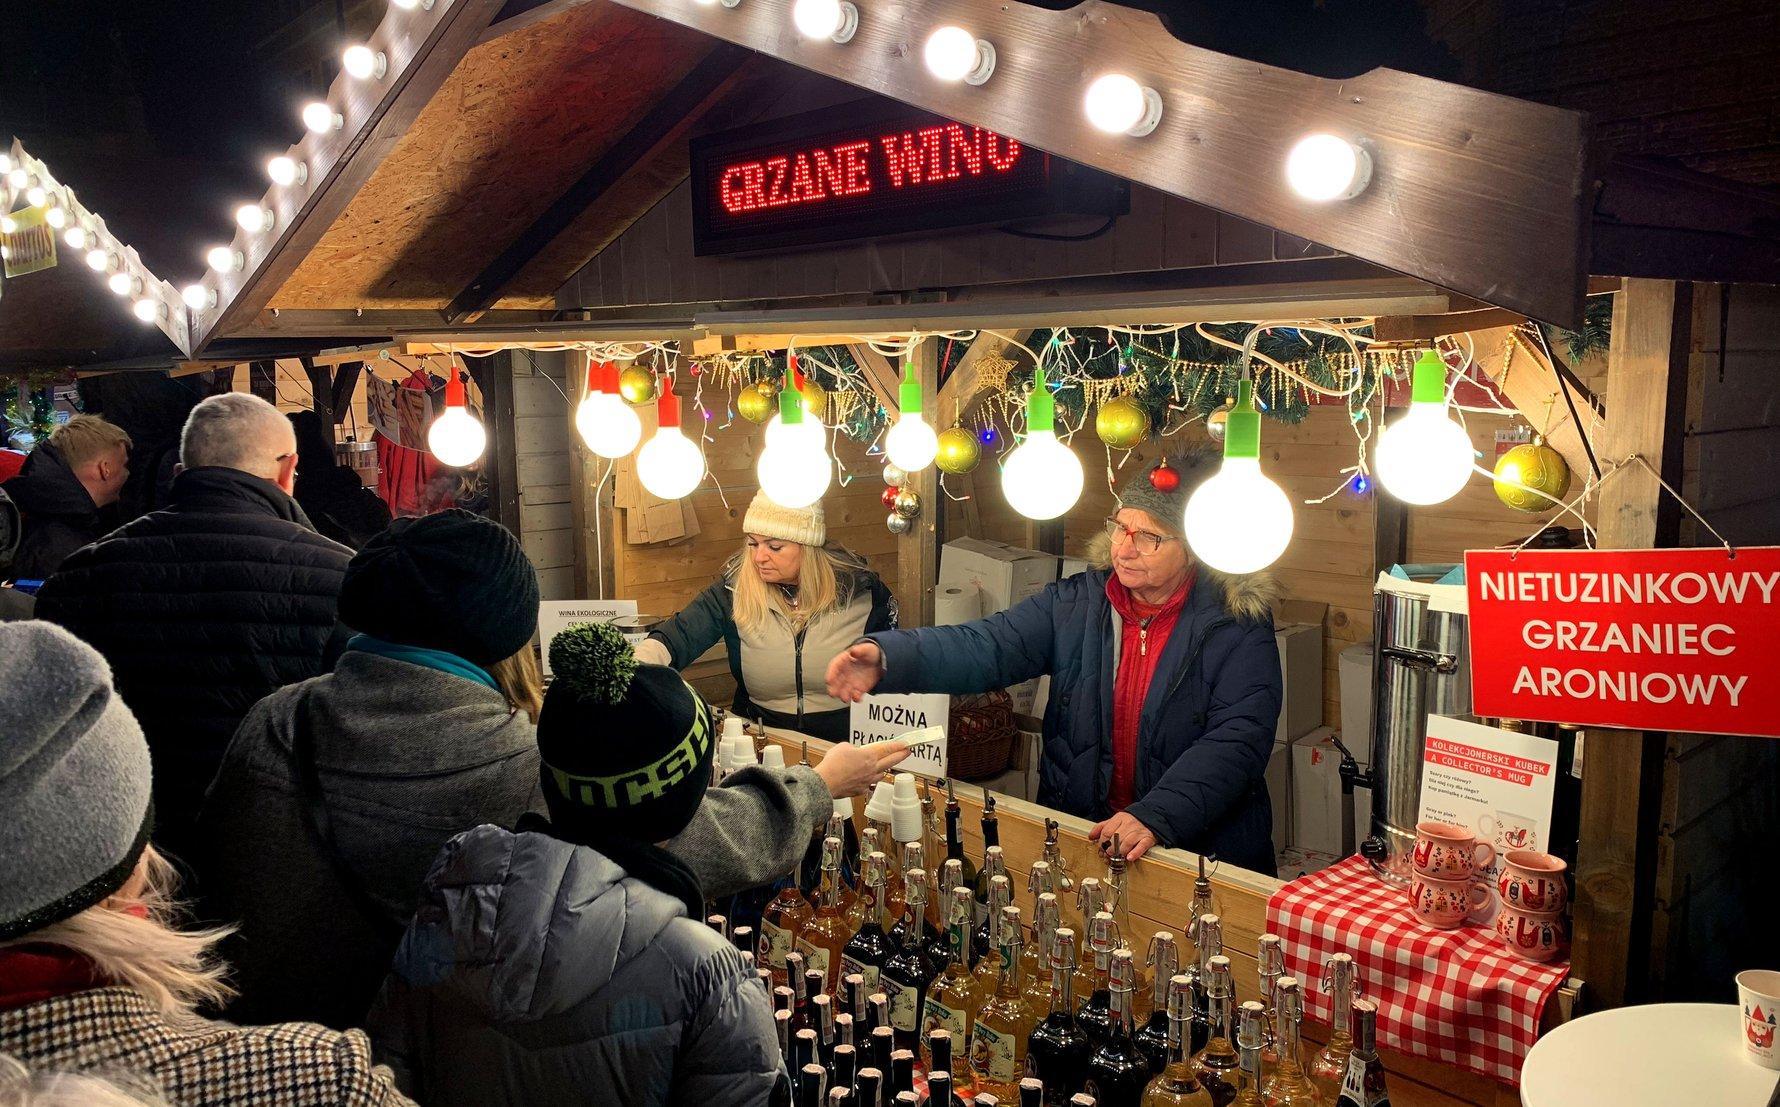 Grzane Wino stall at Gdańsk Christmas Markets